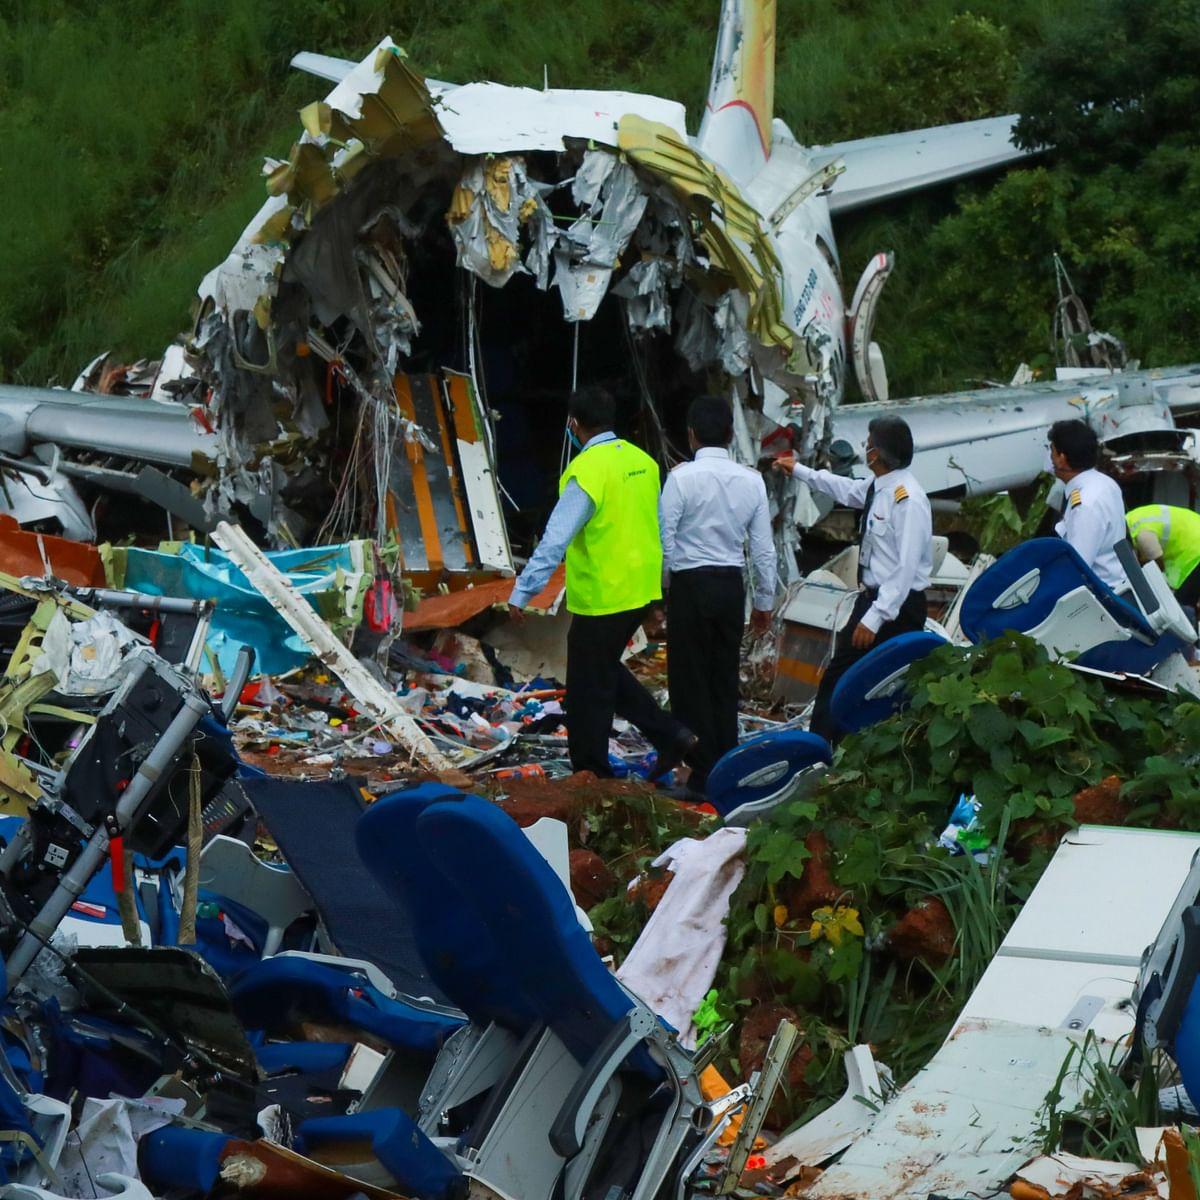 Calicut Air India Plane Crash: AI Express says 2 relief flights arranged